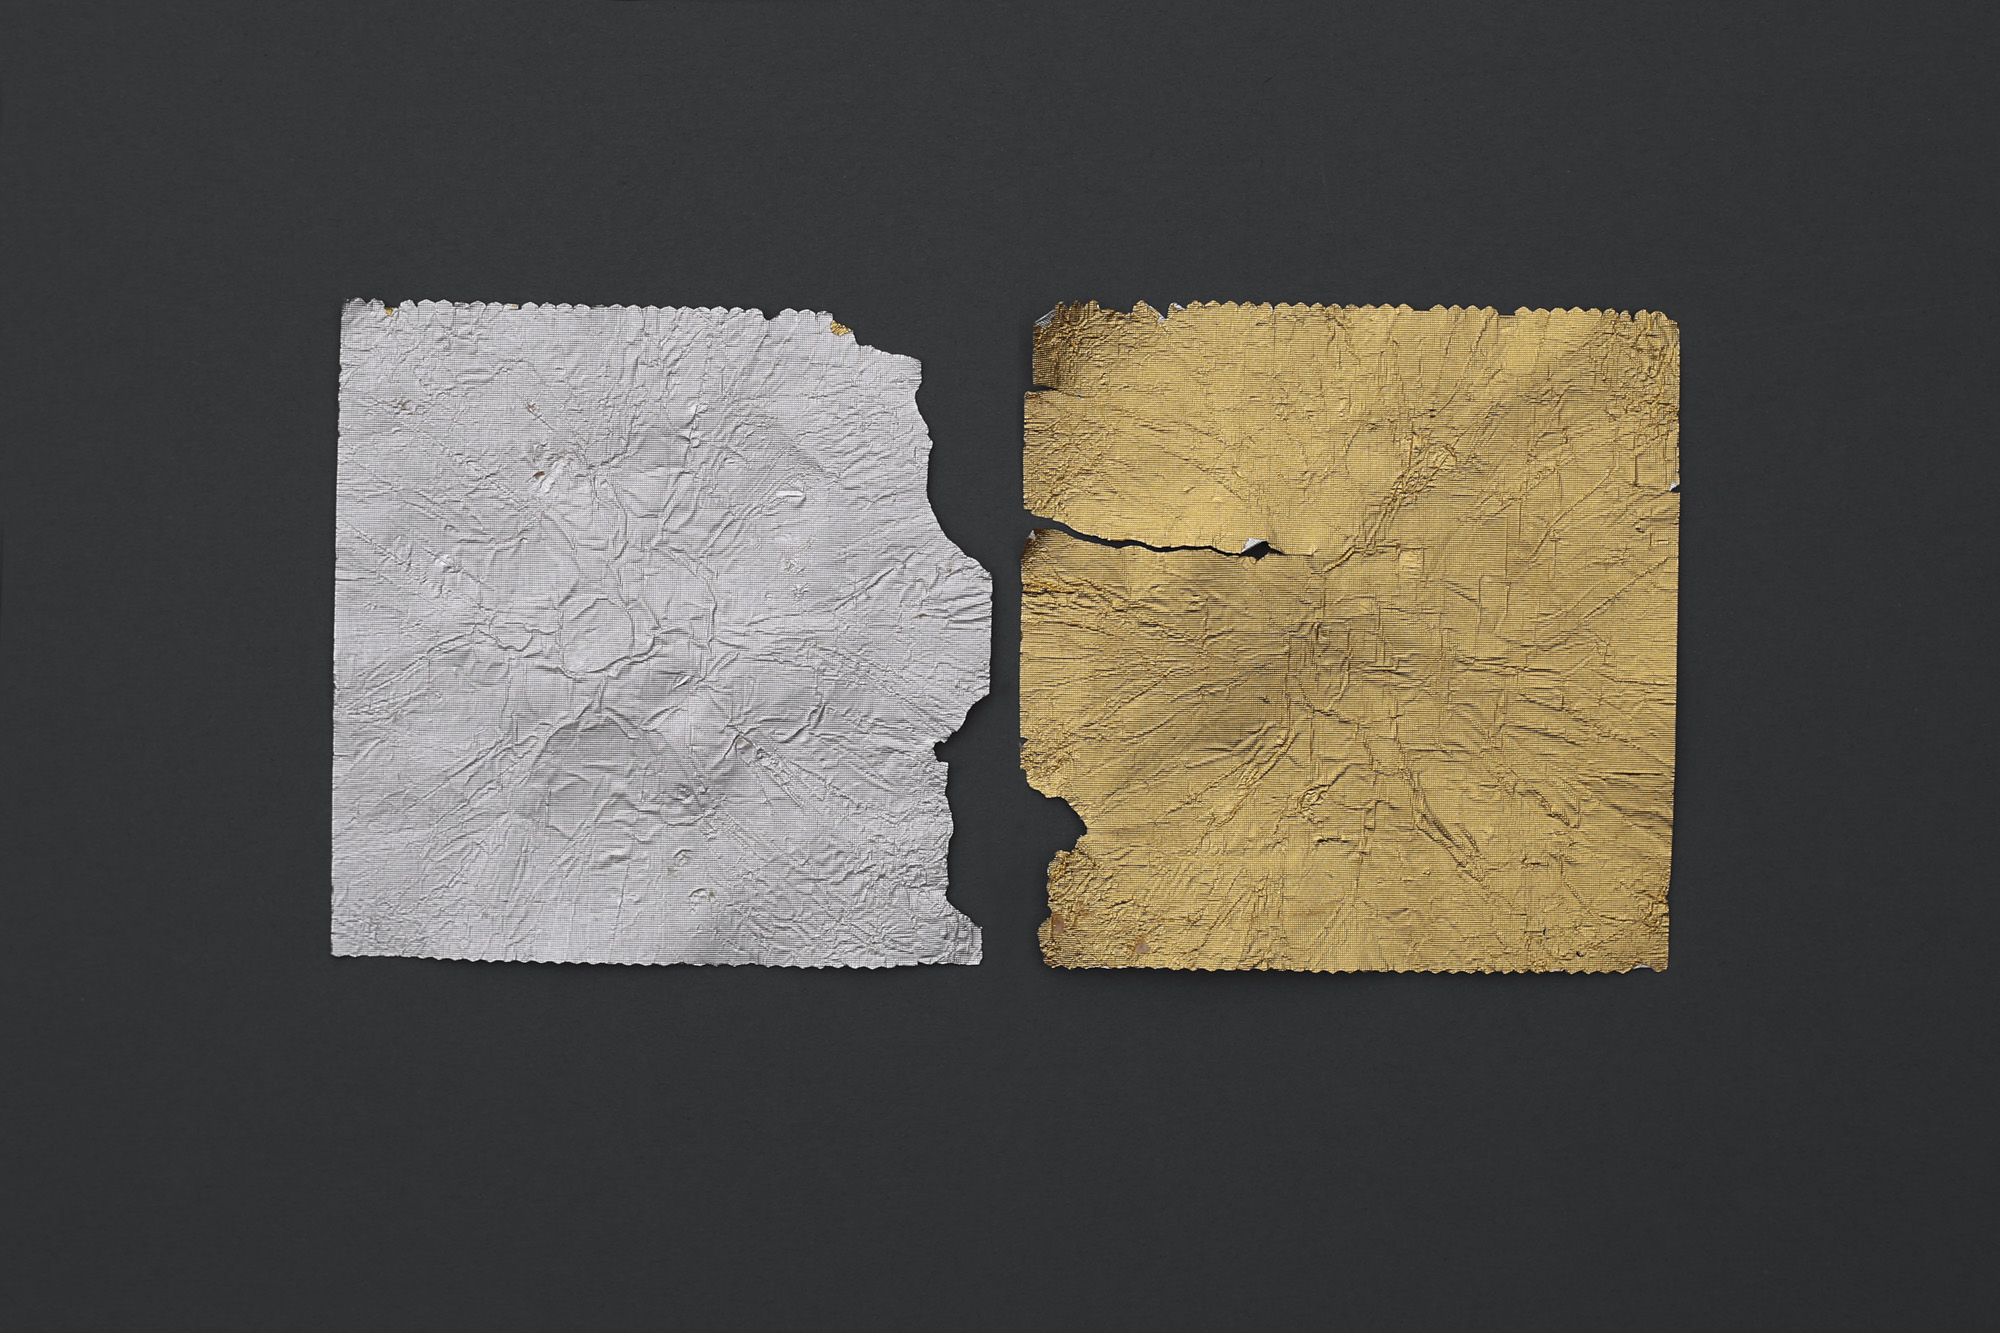 Unwrapped-22.jpg